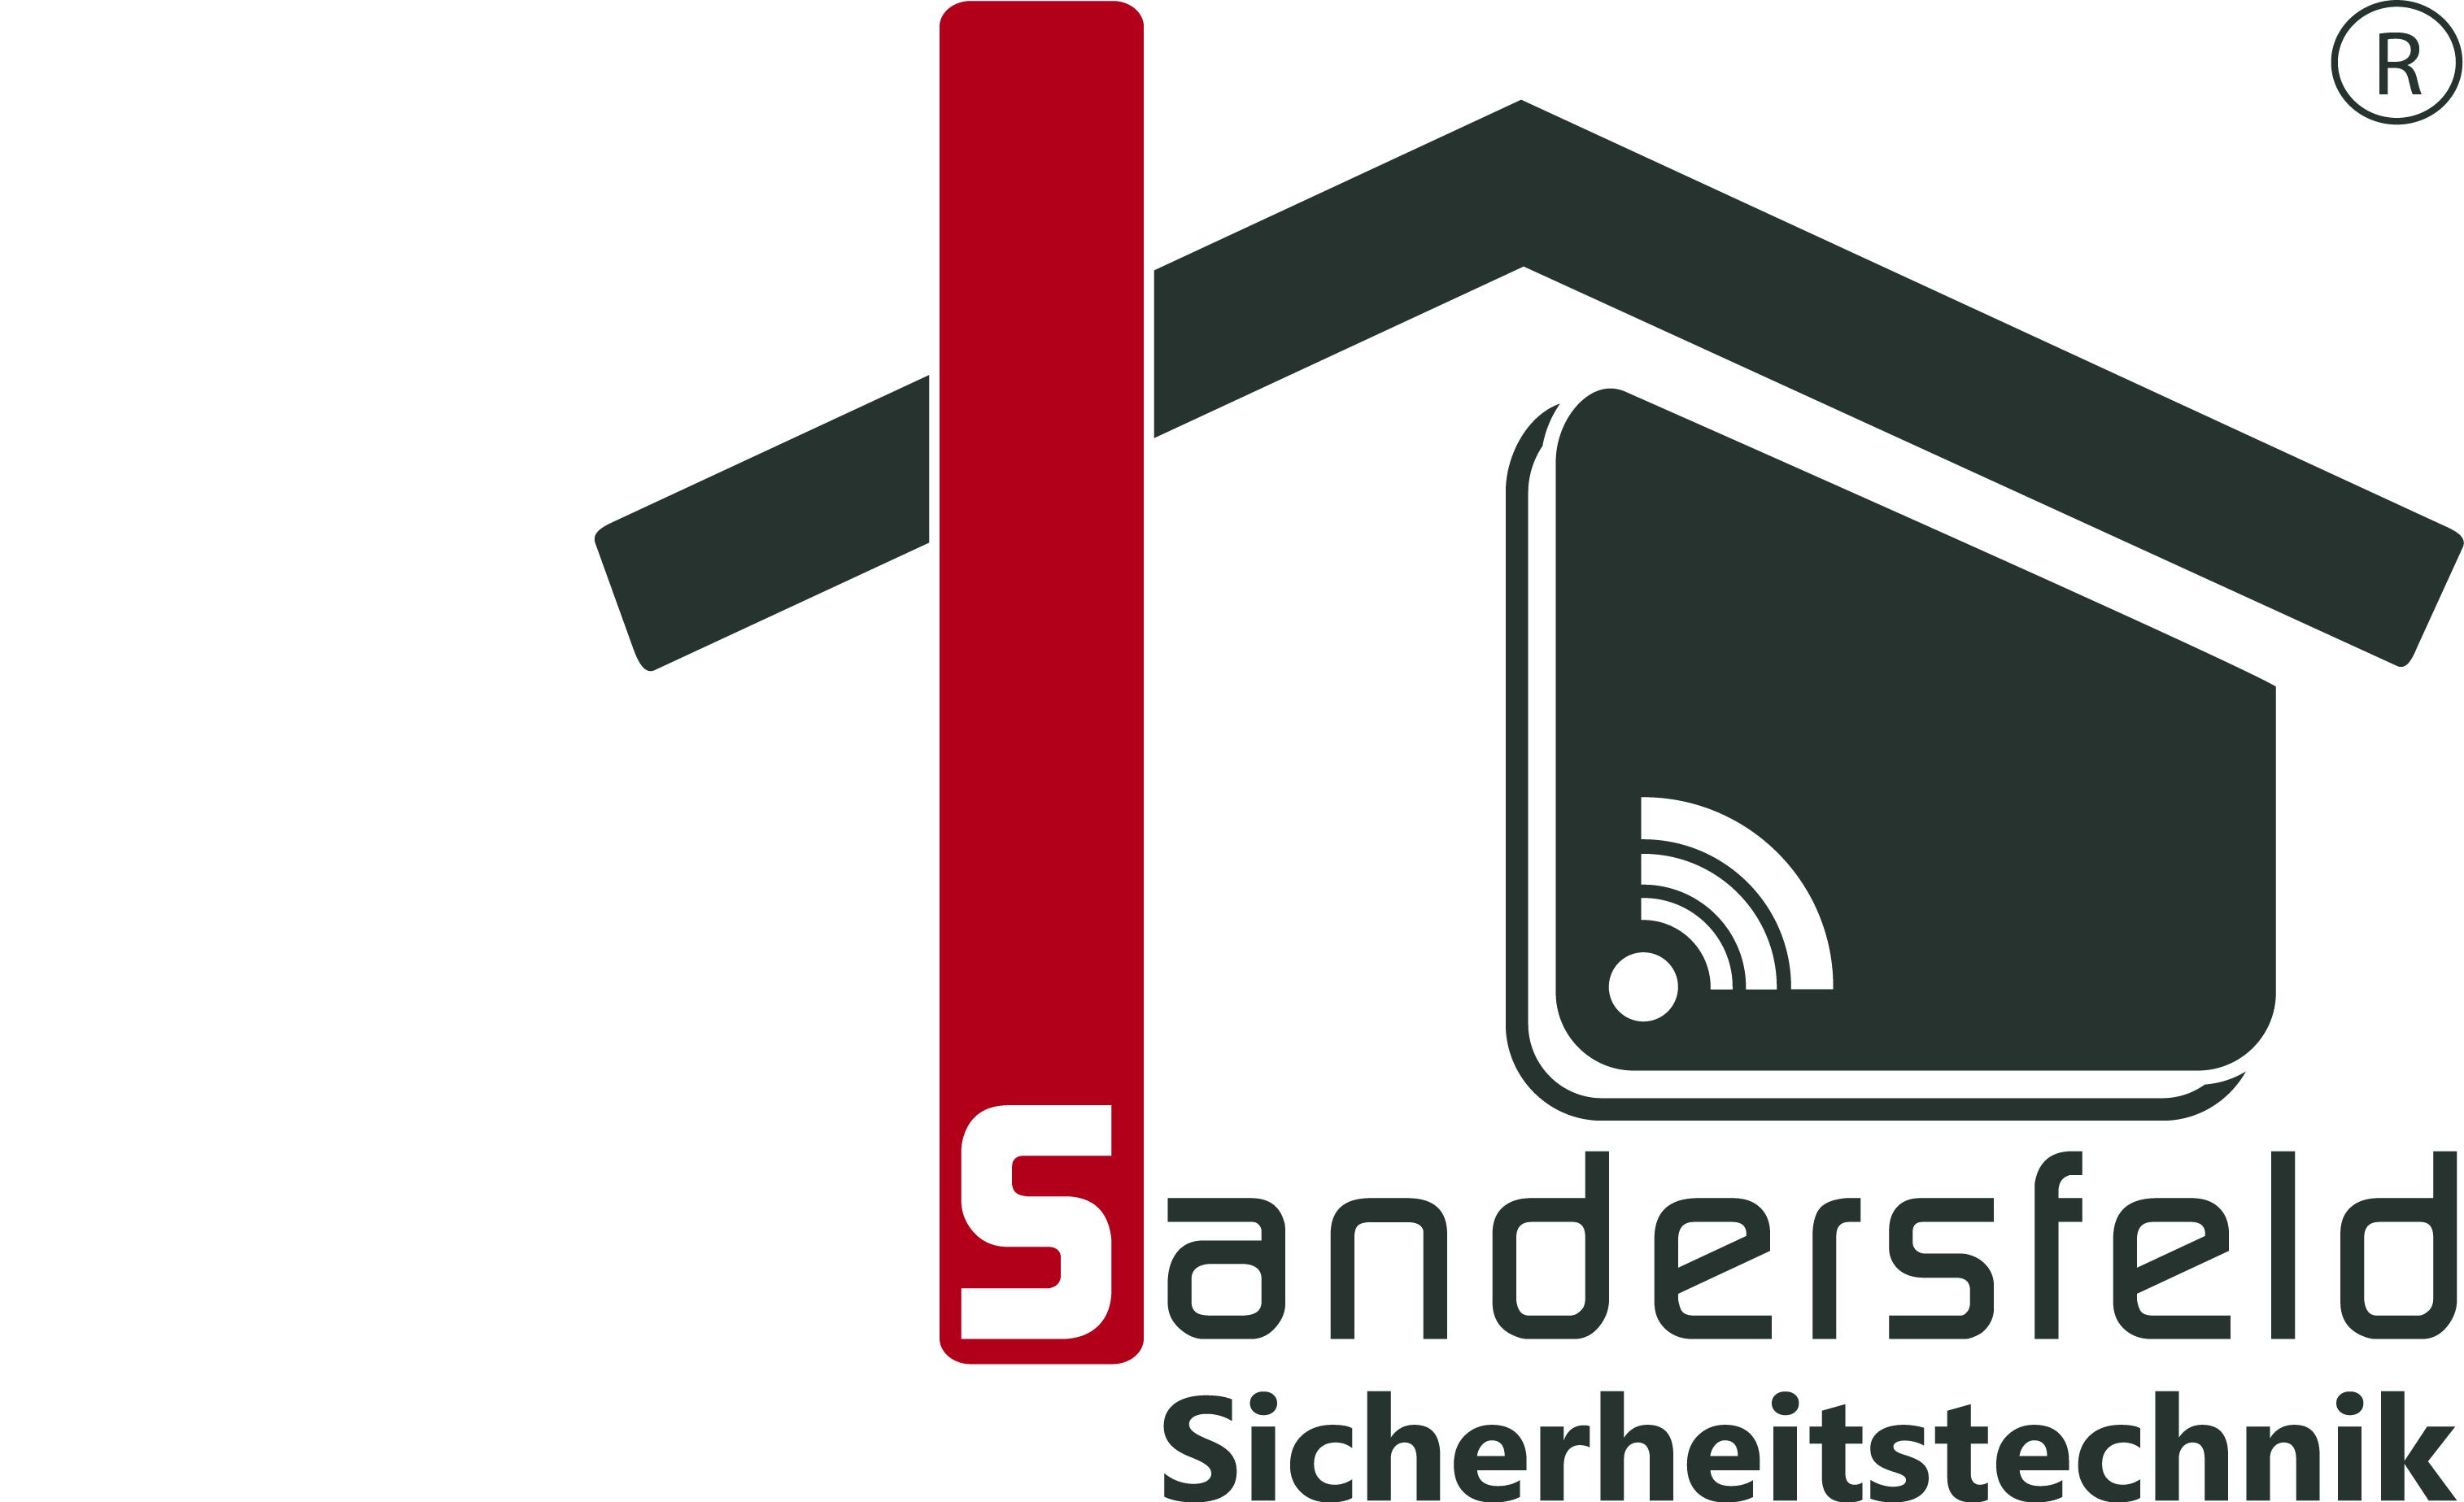 Sandersfeld Sicherheitstechnik GmbH